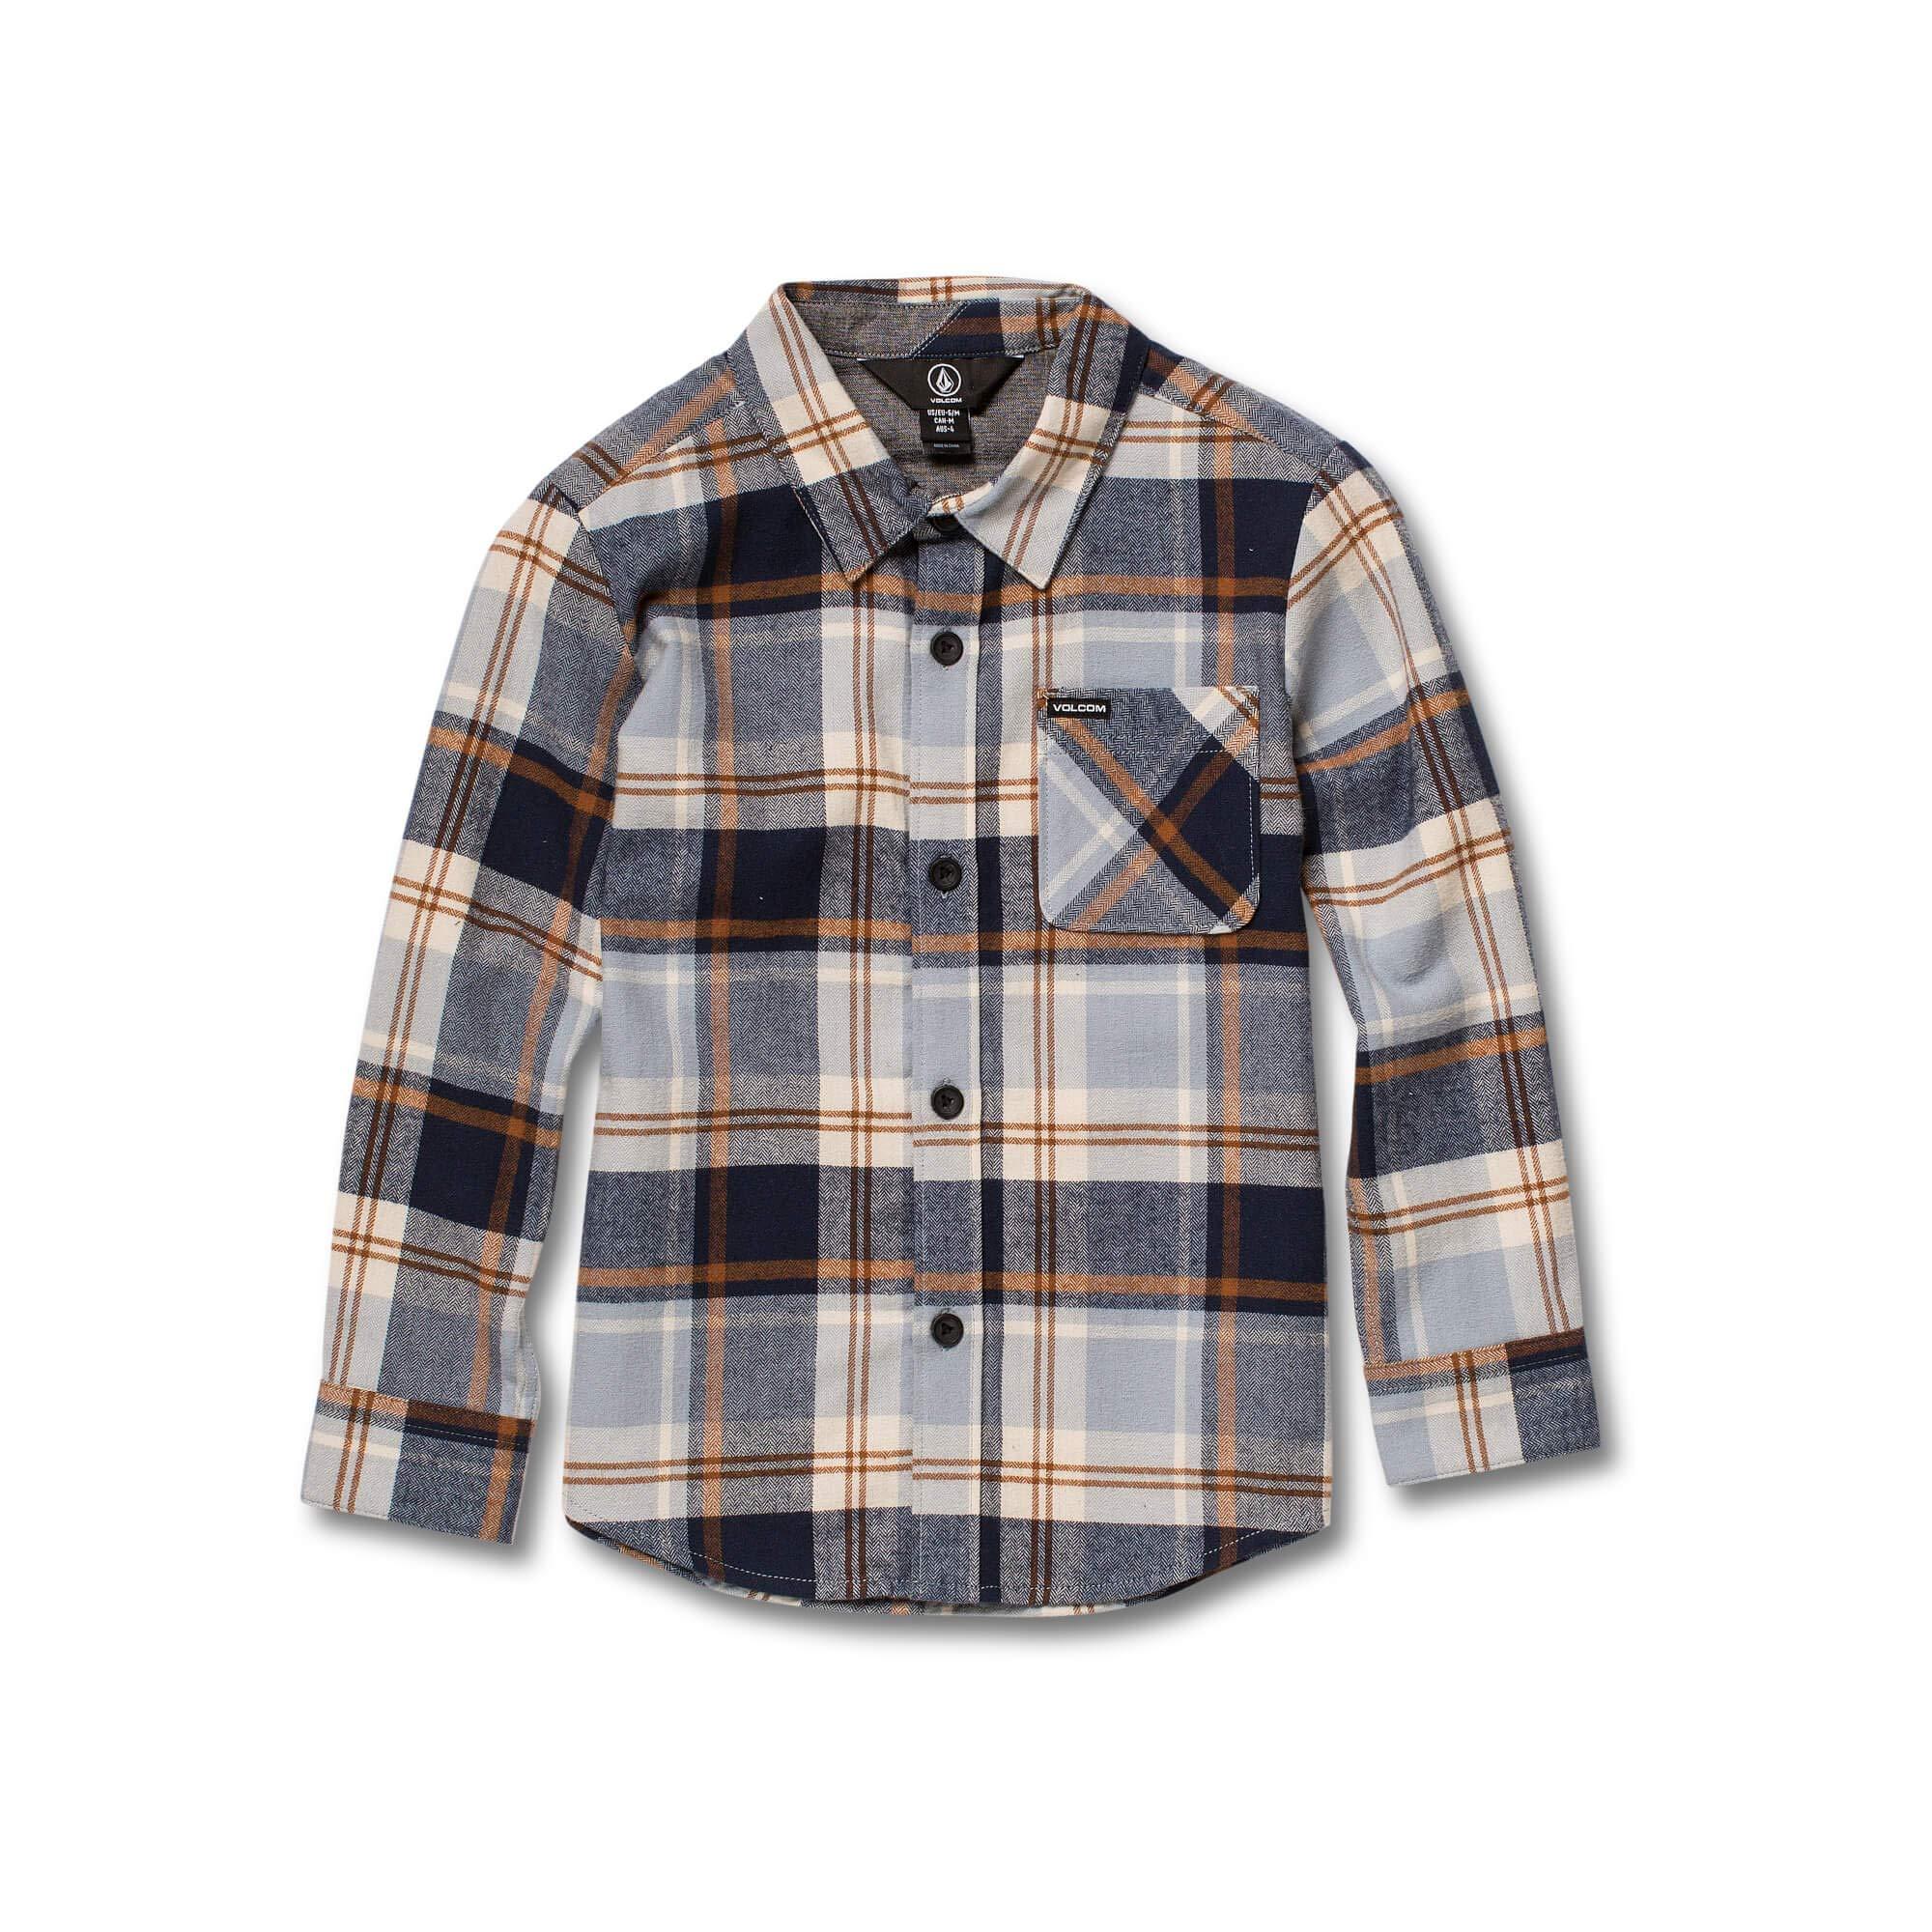 Volcom Little Boys' Caden Plaid Long Sleeve Flannel Button Up Shirt, Slate Blue, 2T